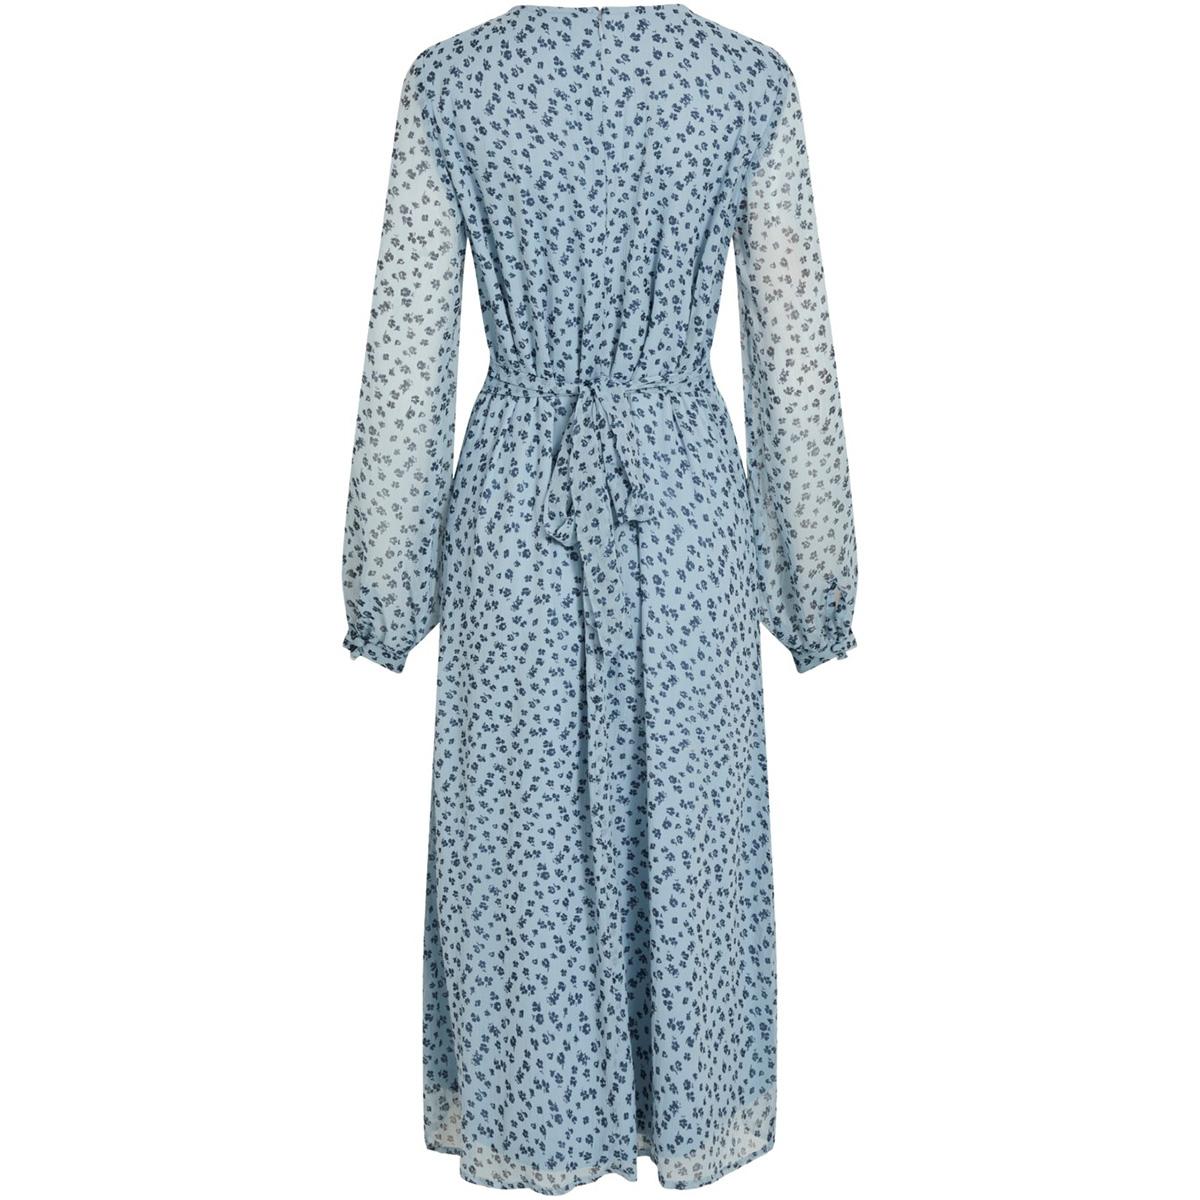 visabbia l/s  midi dress 14058191 vila jurk ashley blue/navy blazer